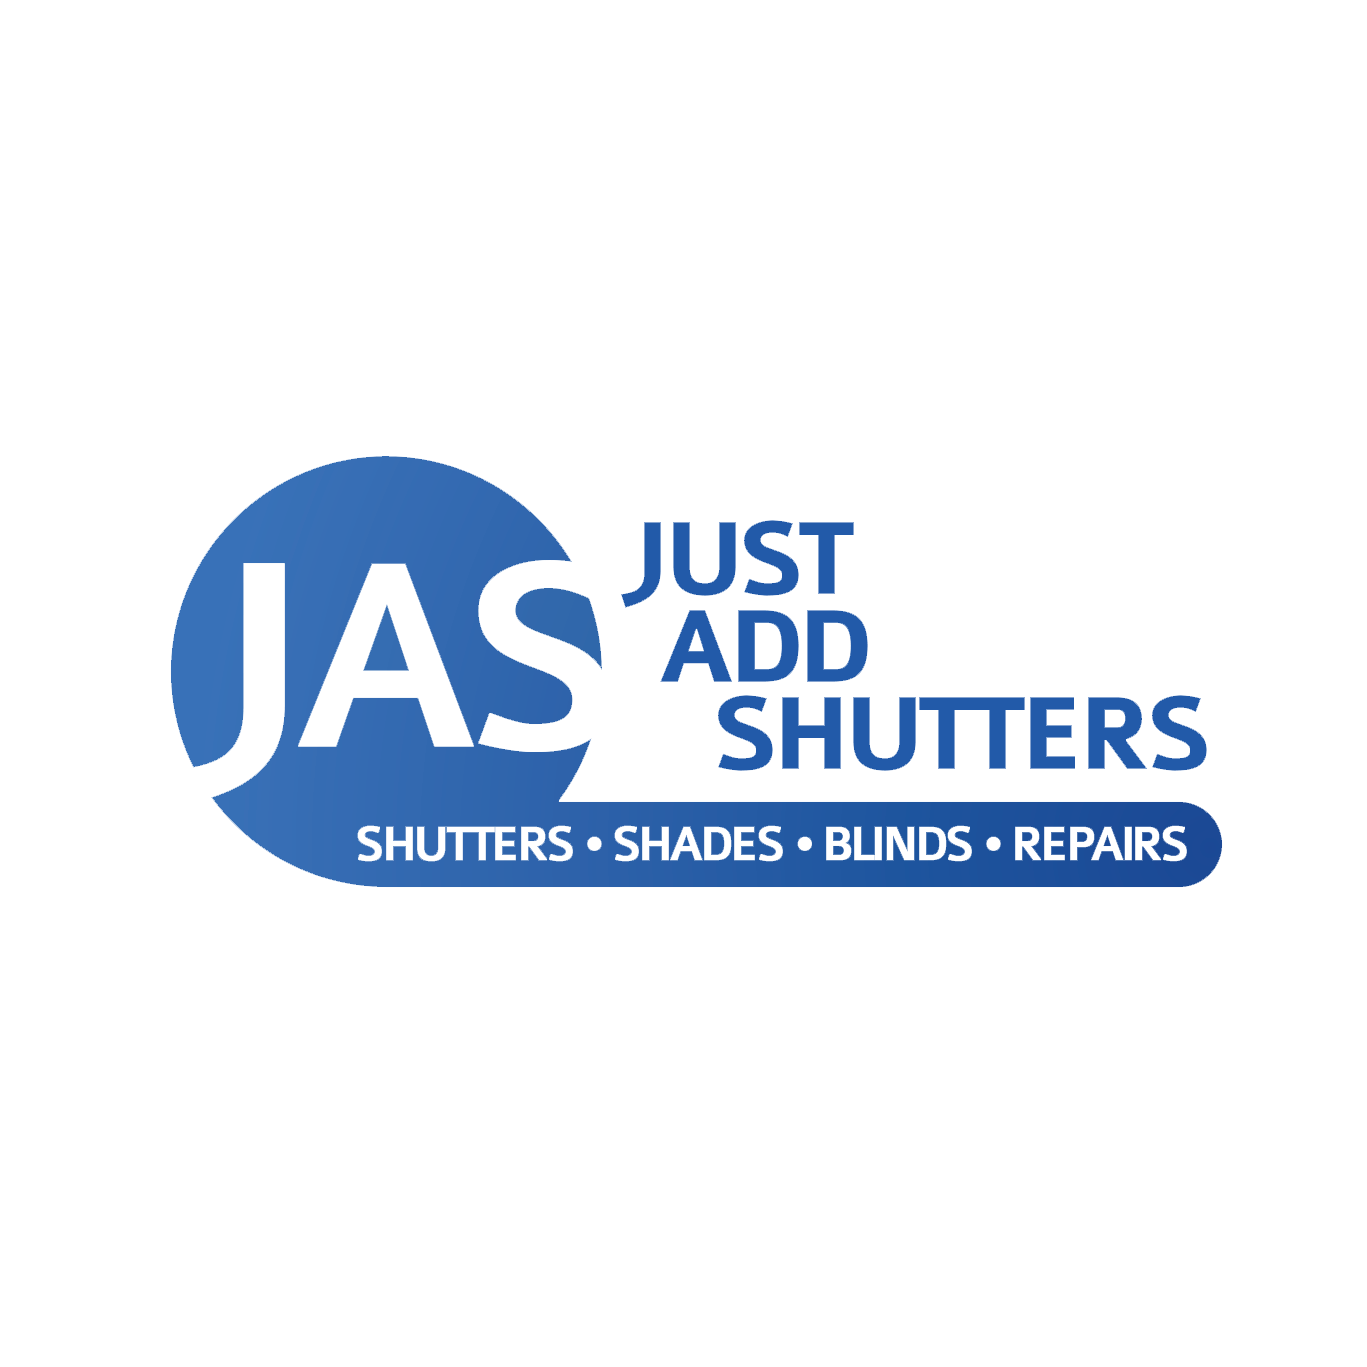 Just Add Shutters